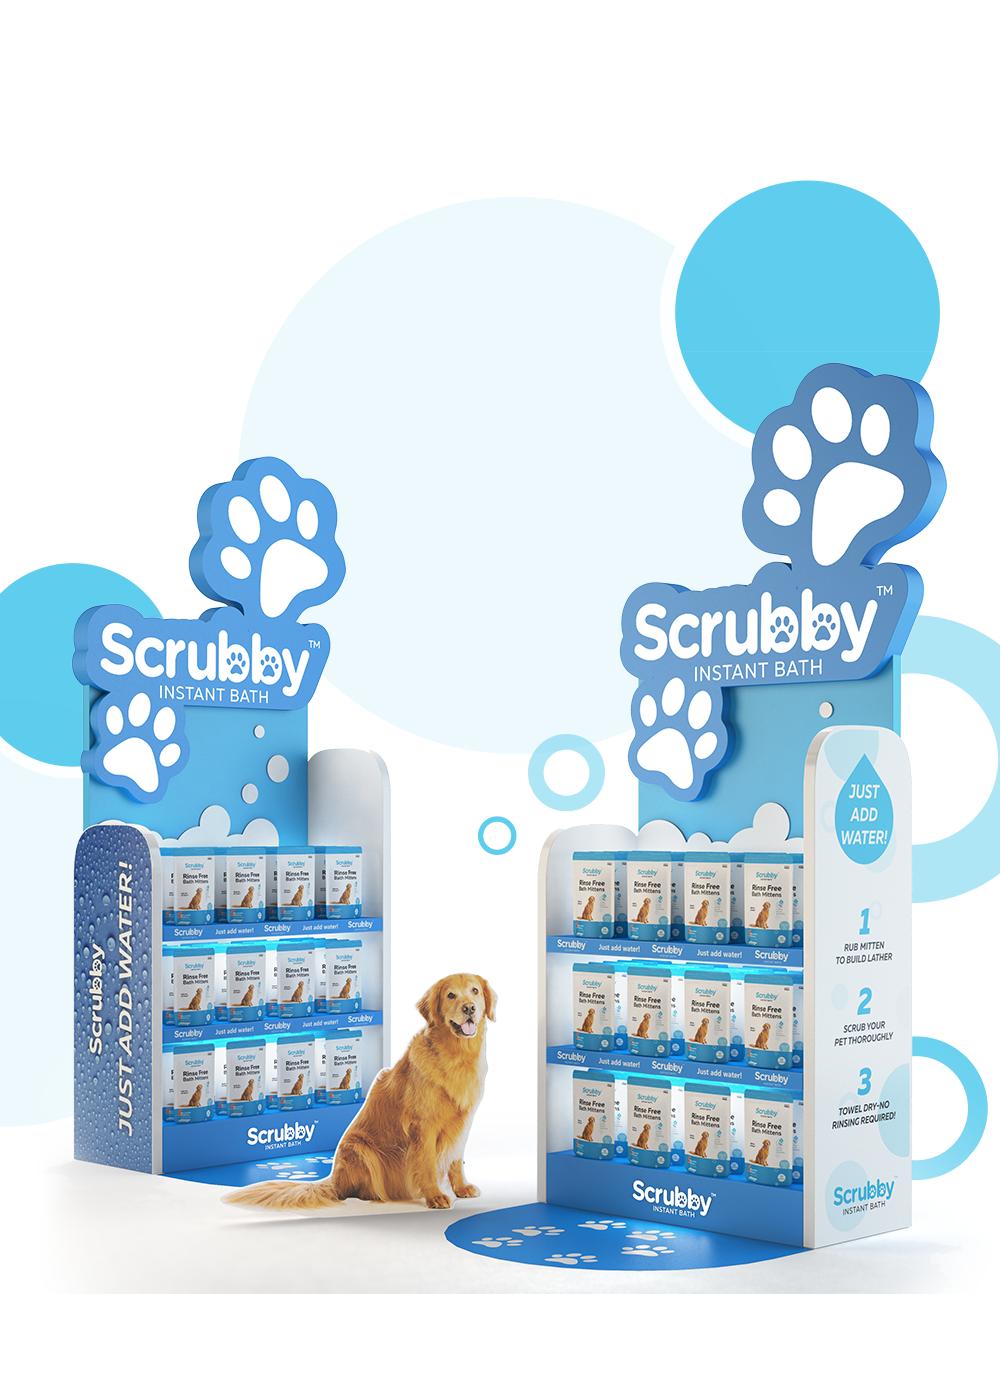 Scrubby Packaging - iDesign Branding